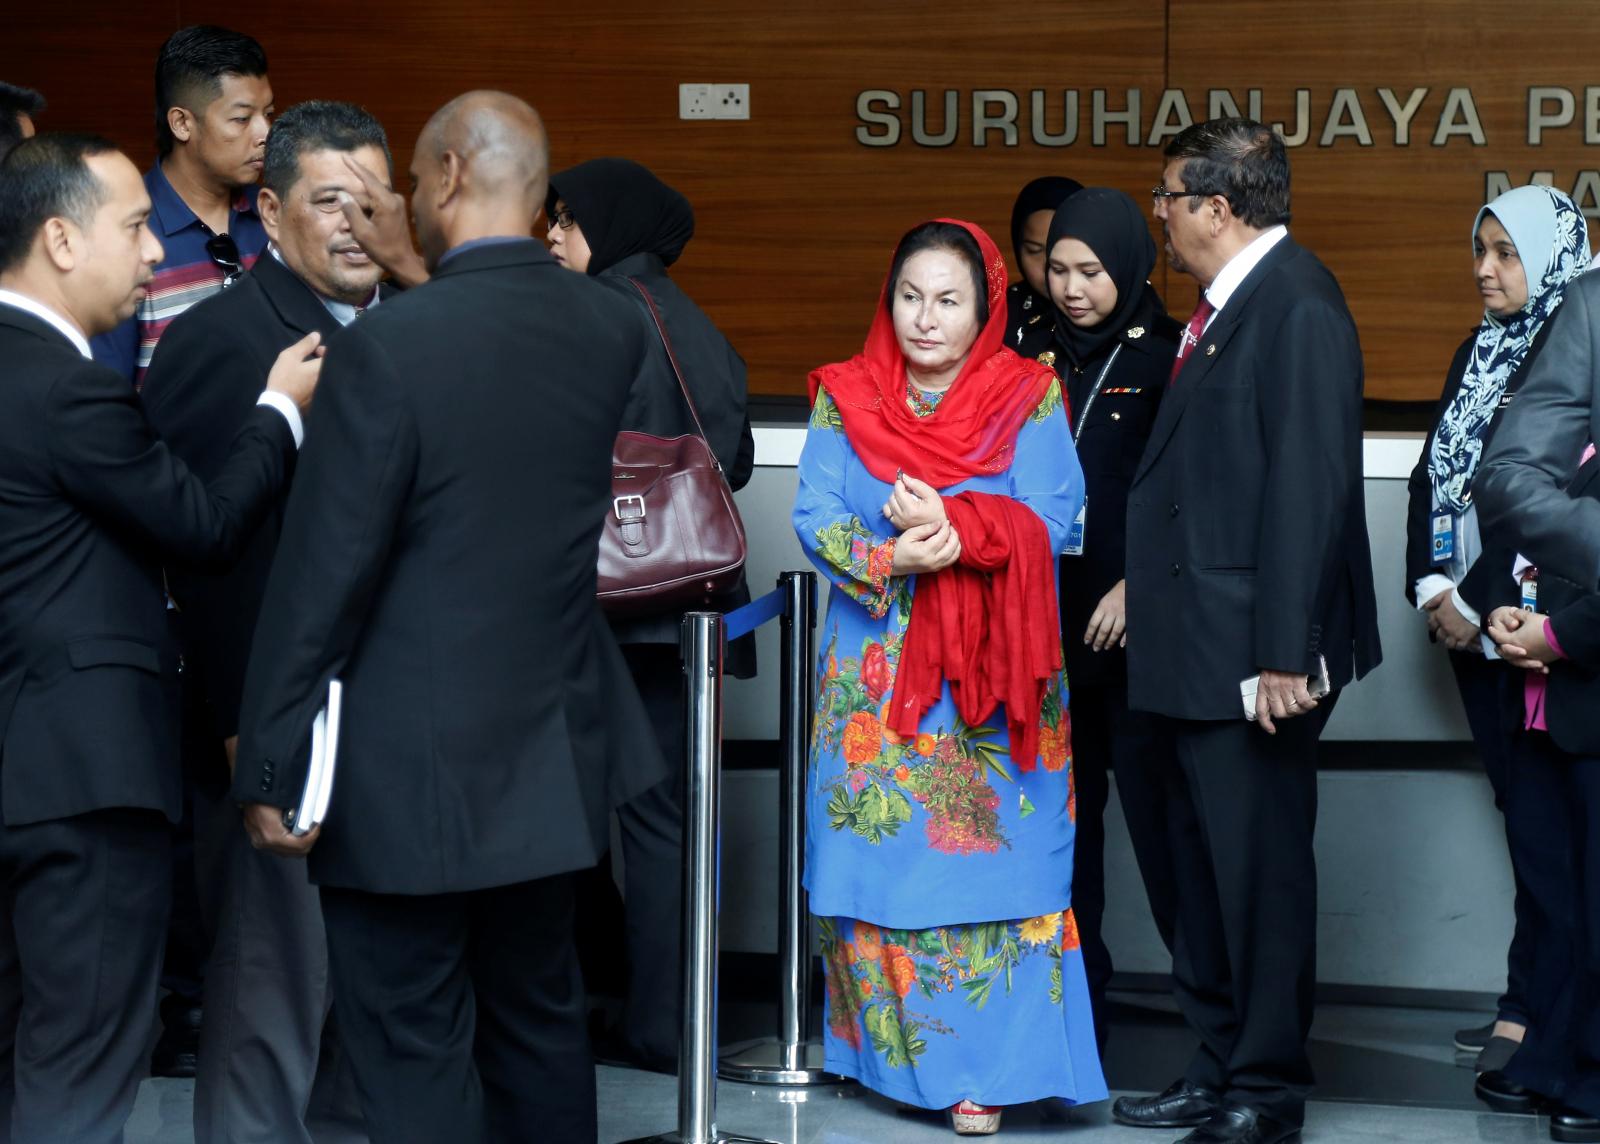 Rosmah Mansor, the wife of former Malaysian prime minister Najib Razak